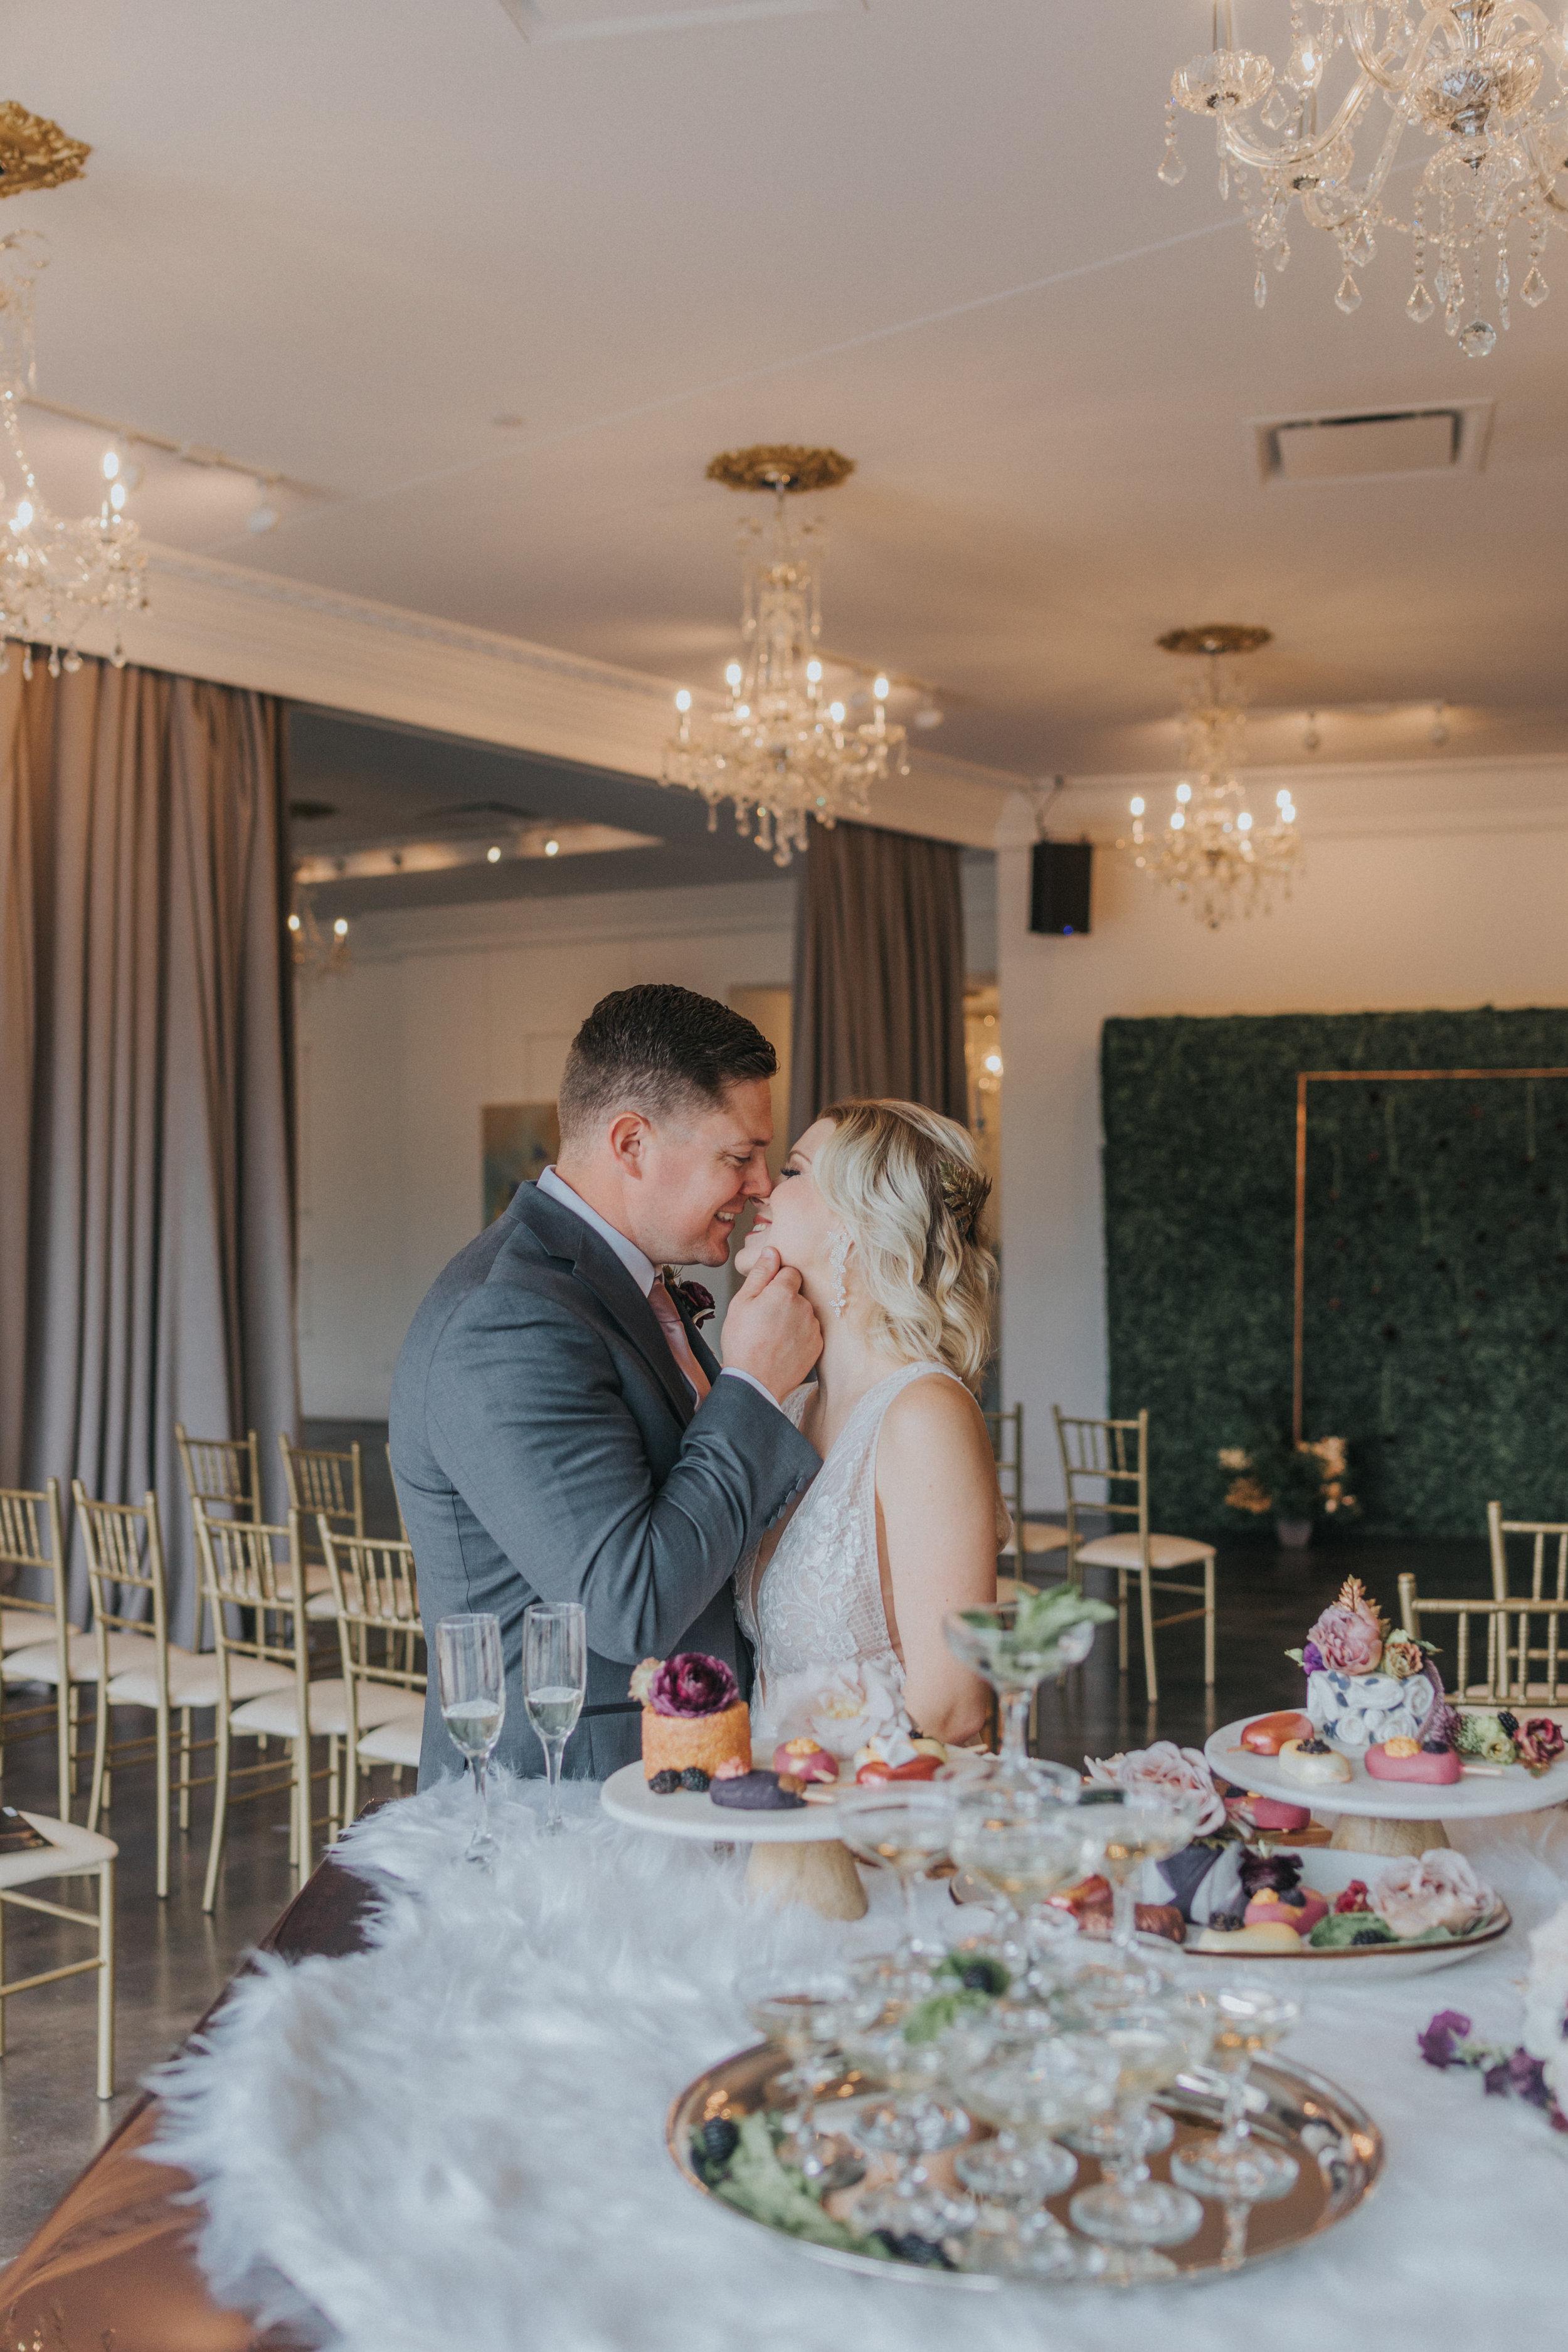 144 tiny-luxe-weddings-omaha-nebraska-midwest-empire-room.jpg